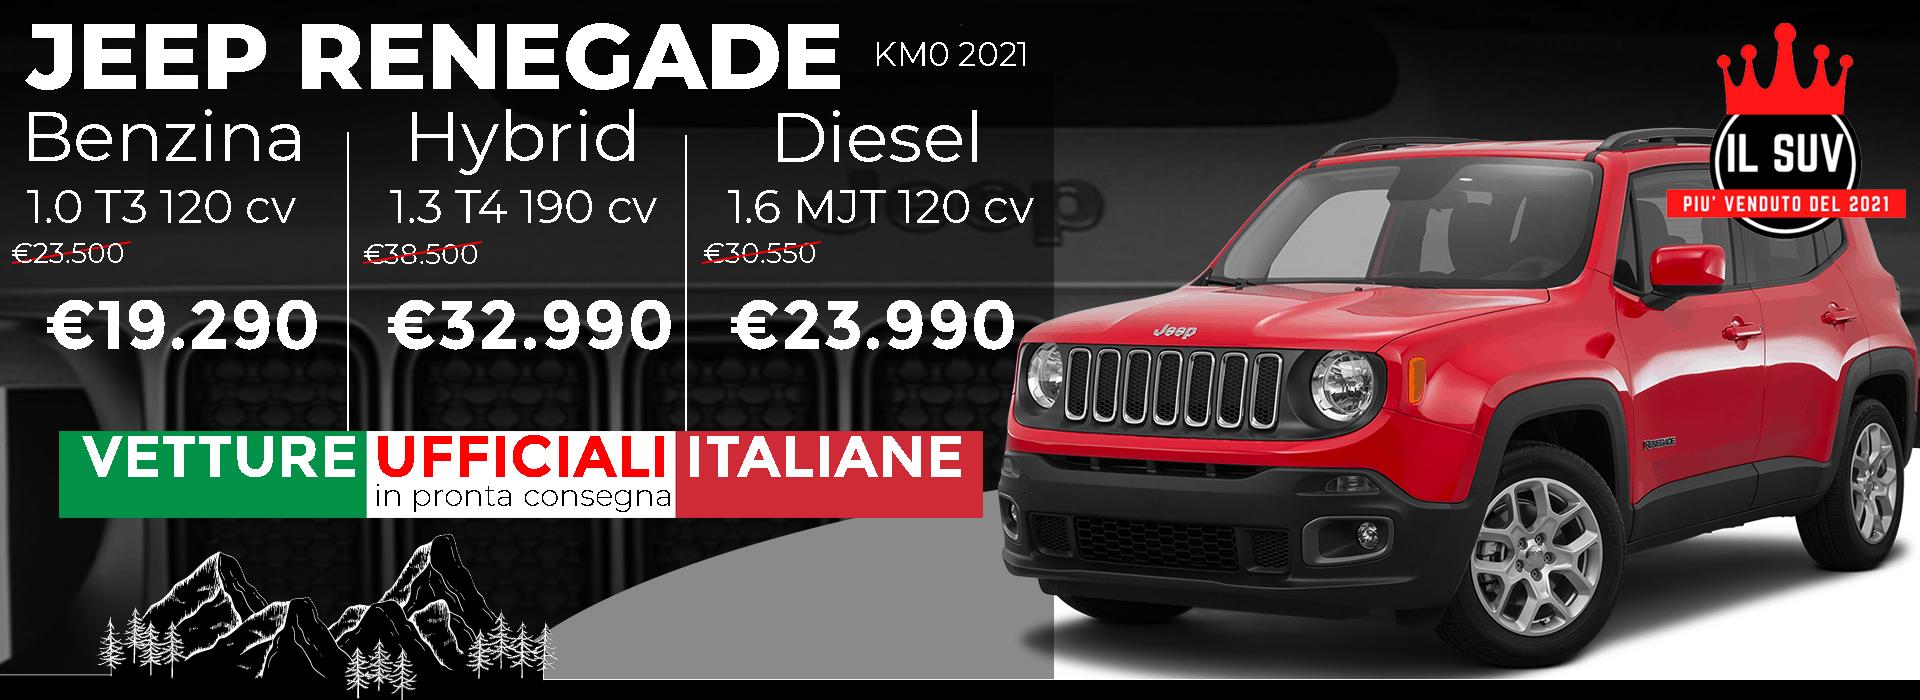 Jeep Renegade KM0